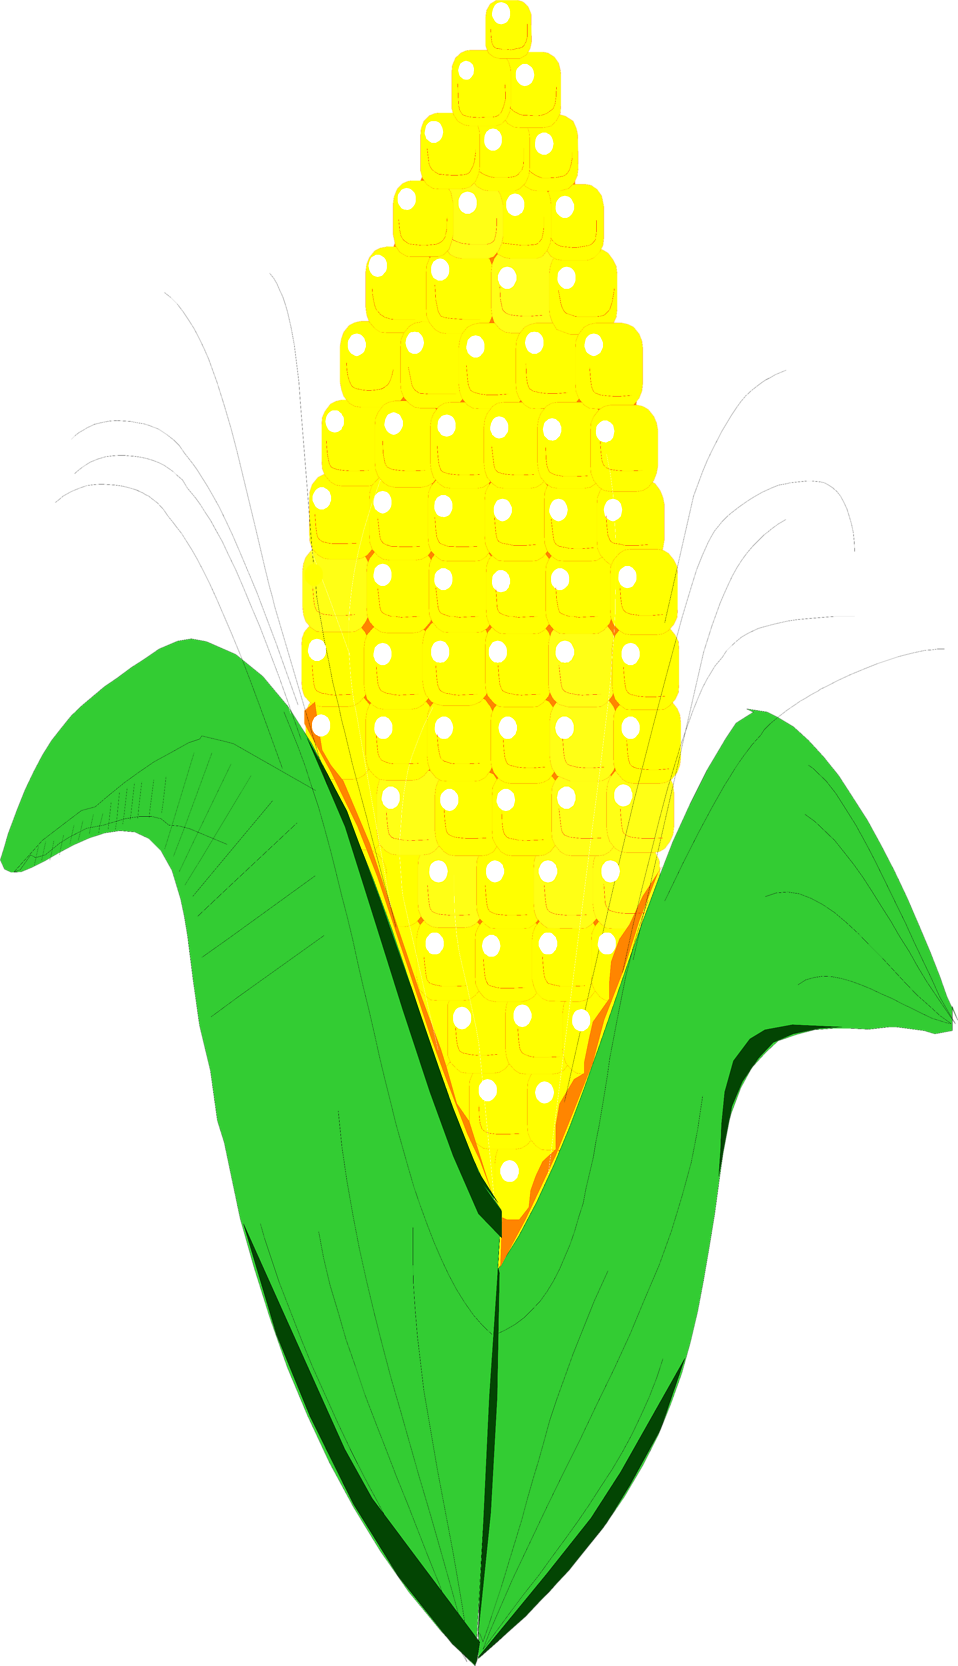 Corn clip art free clipart images 3 clipartpost